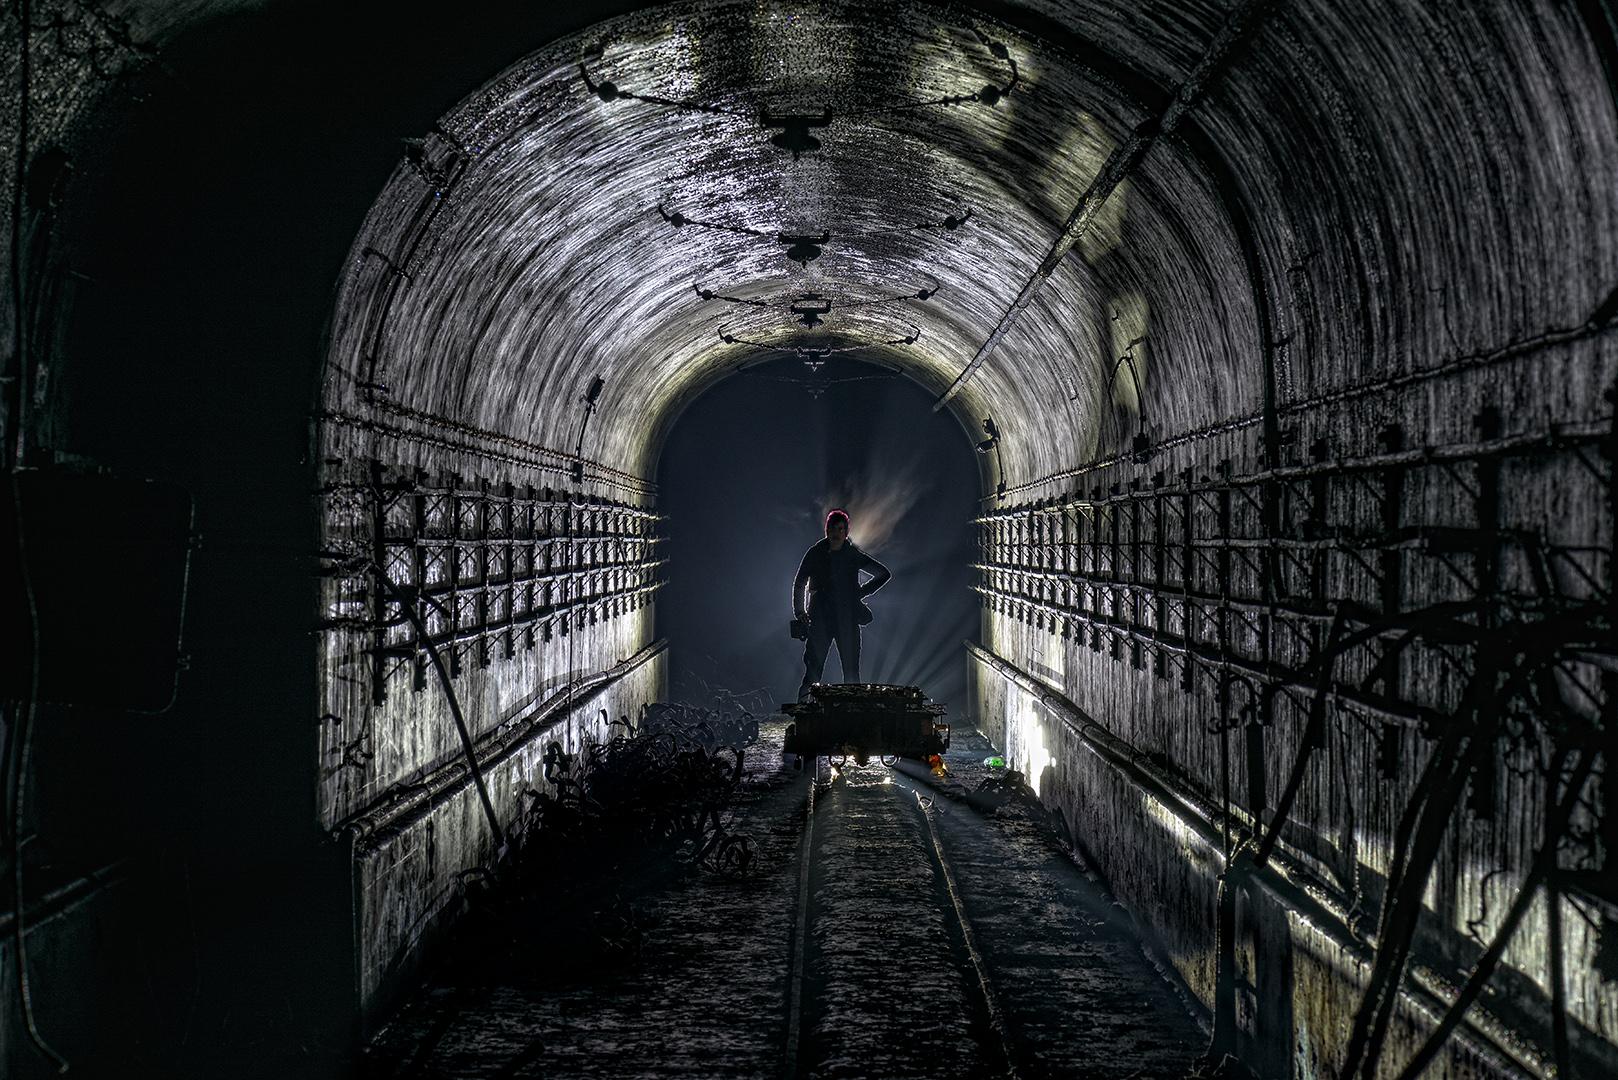 Maginot-Linie, Ingrid im Zentralstollen